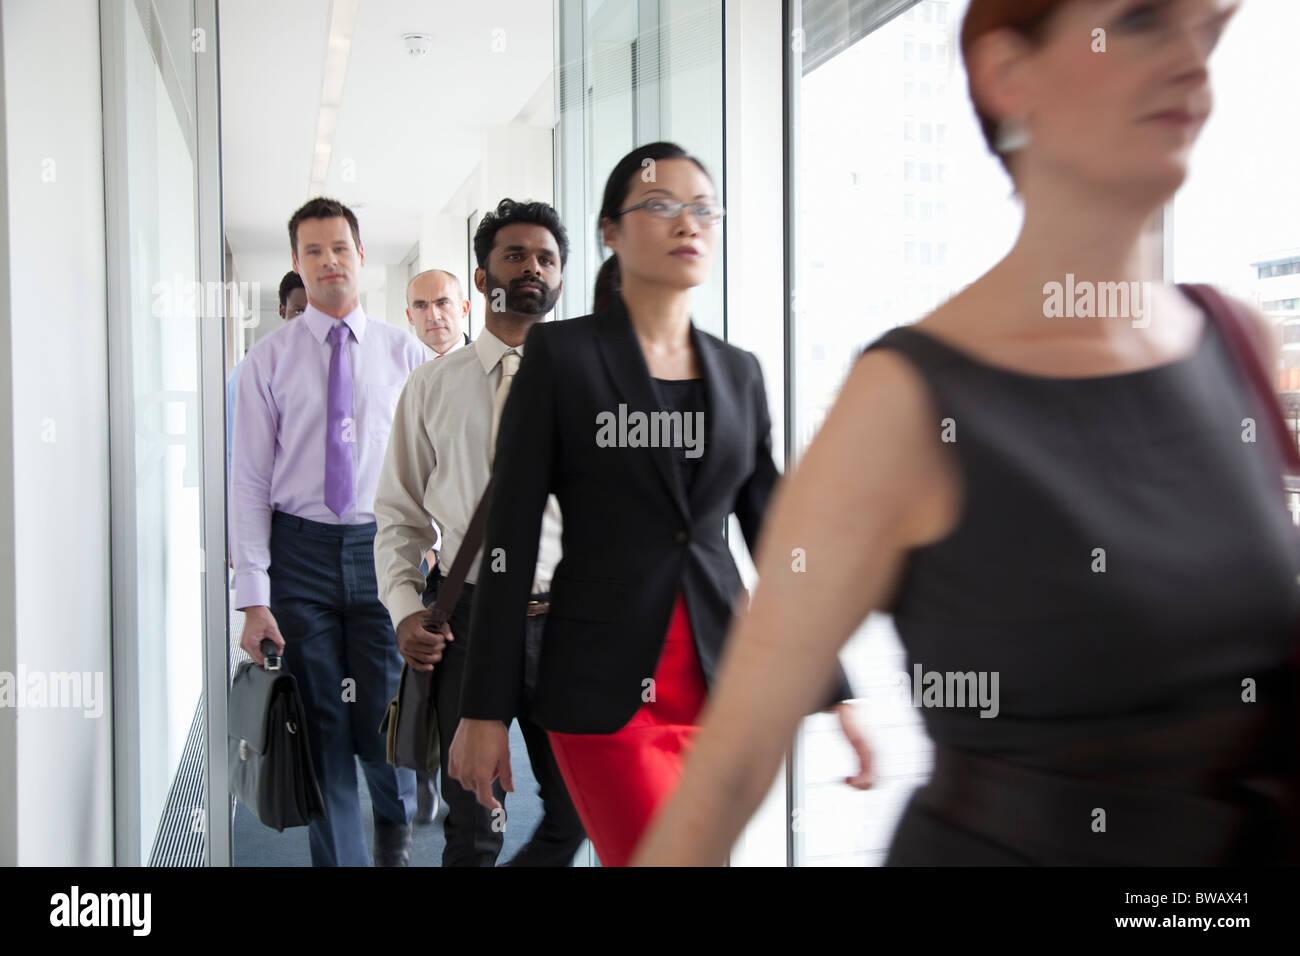 Business people rushing past camera - Stock Image